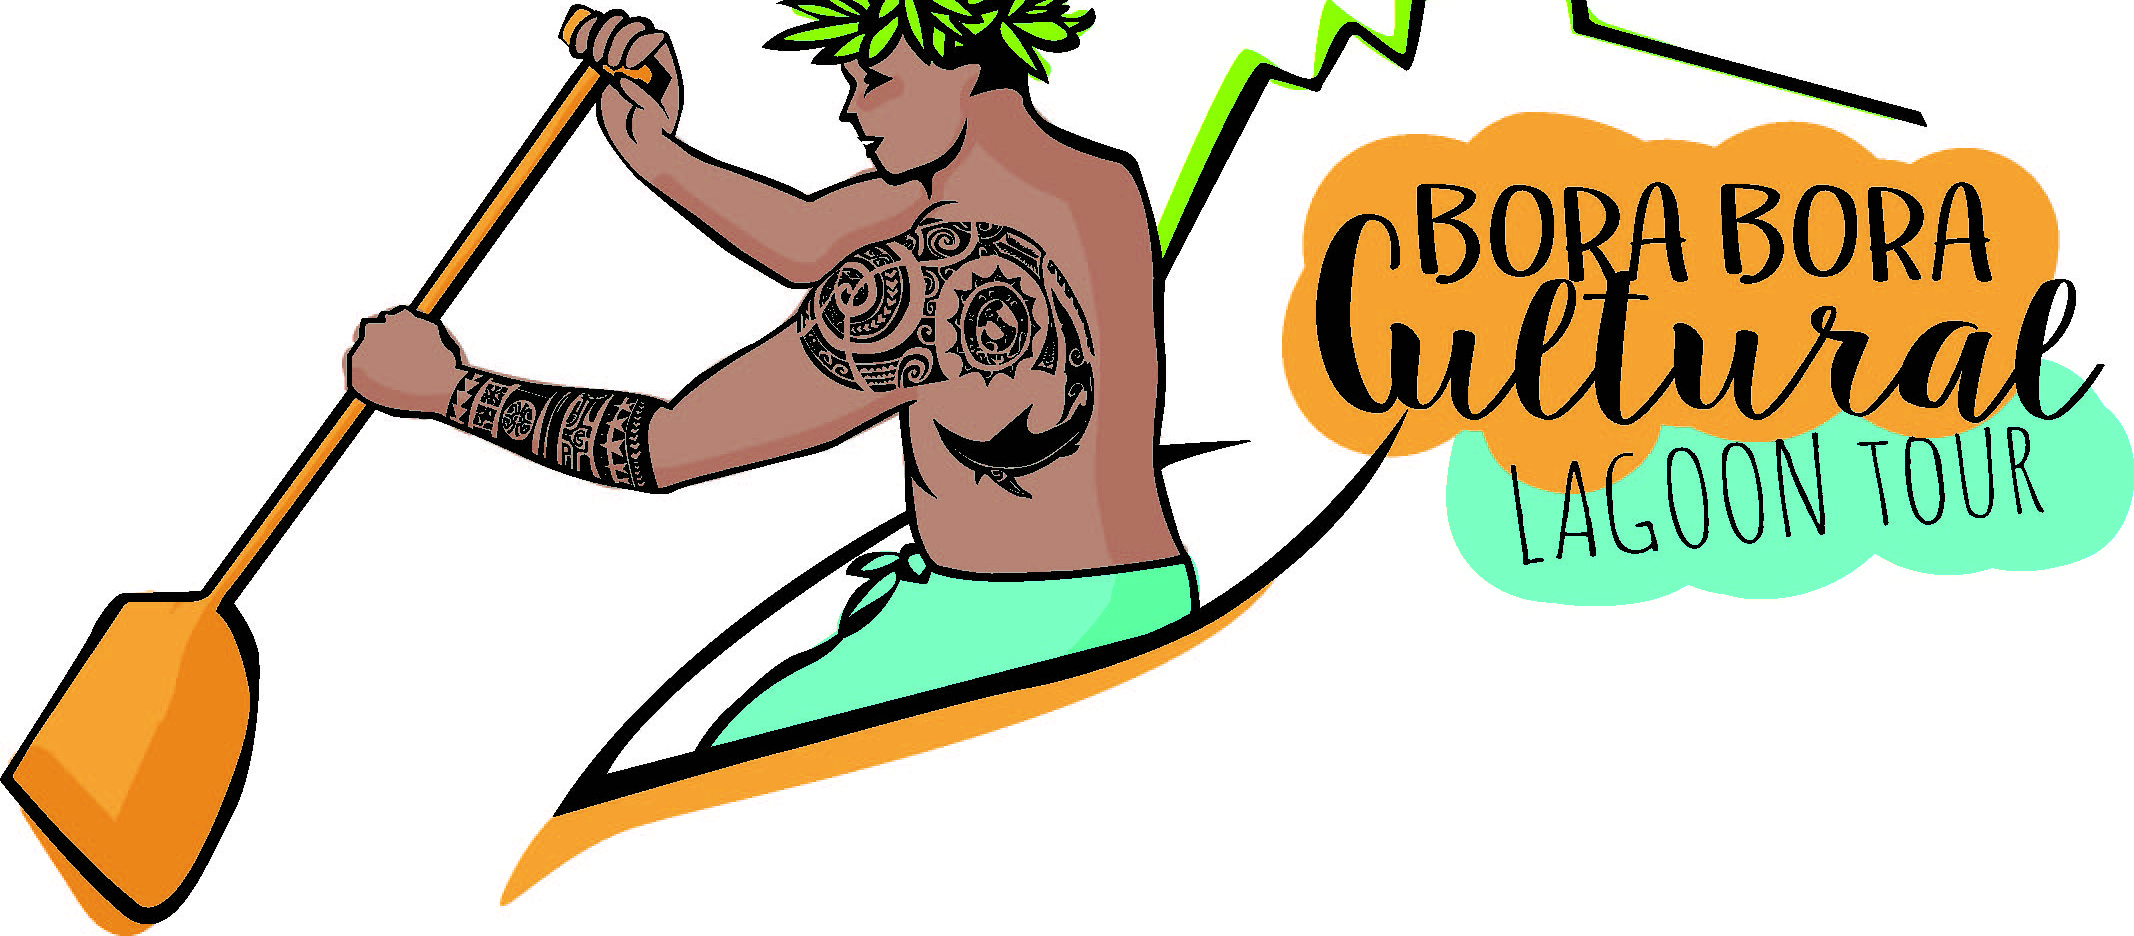 https://tahititourisme.cl/wp-content/uploads/2018/12/Bob-cultural-lagoon-tour.jpg